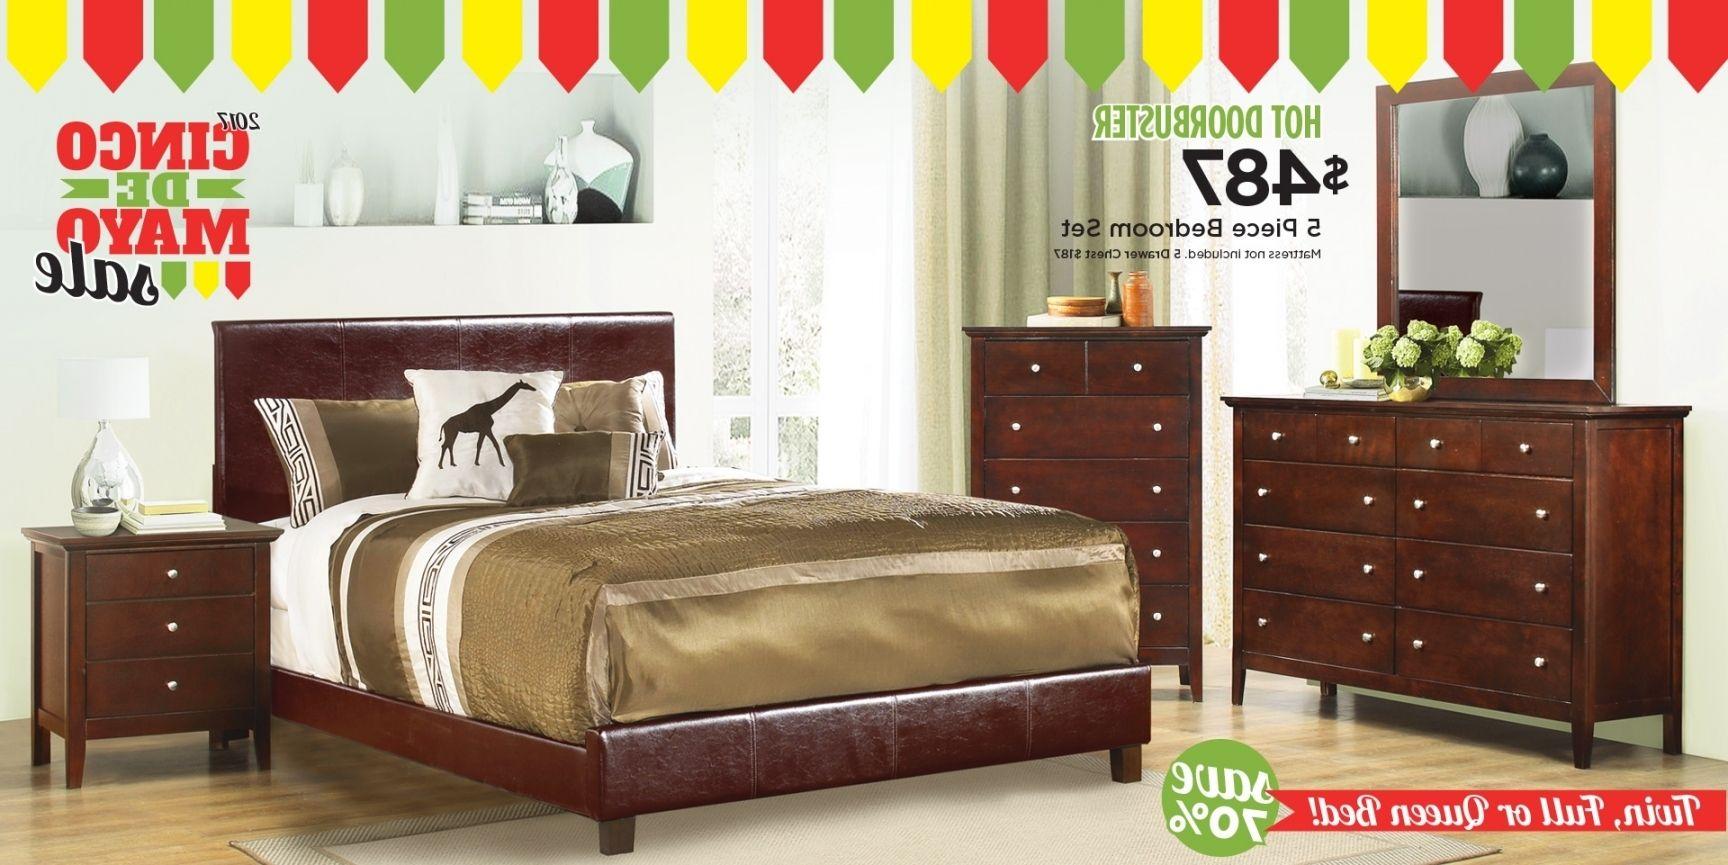 Bedroom Furniture Sets Layaway Bedroom Furniture Pinterest - Layaway bedroom furniture